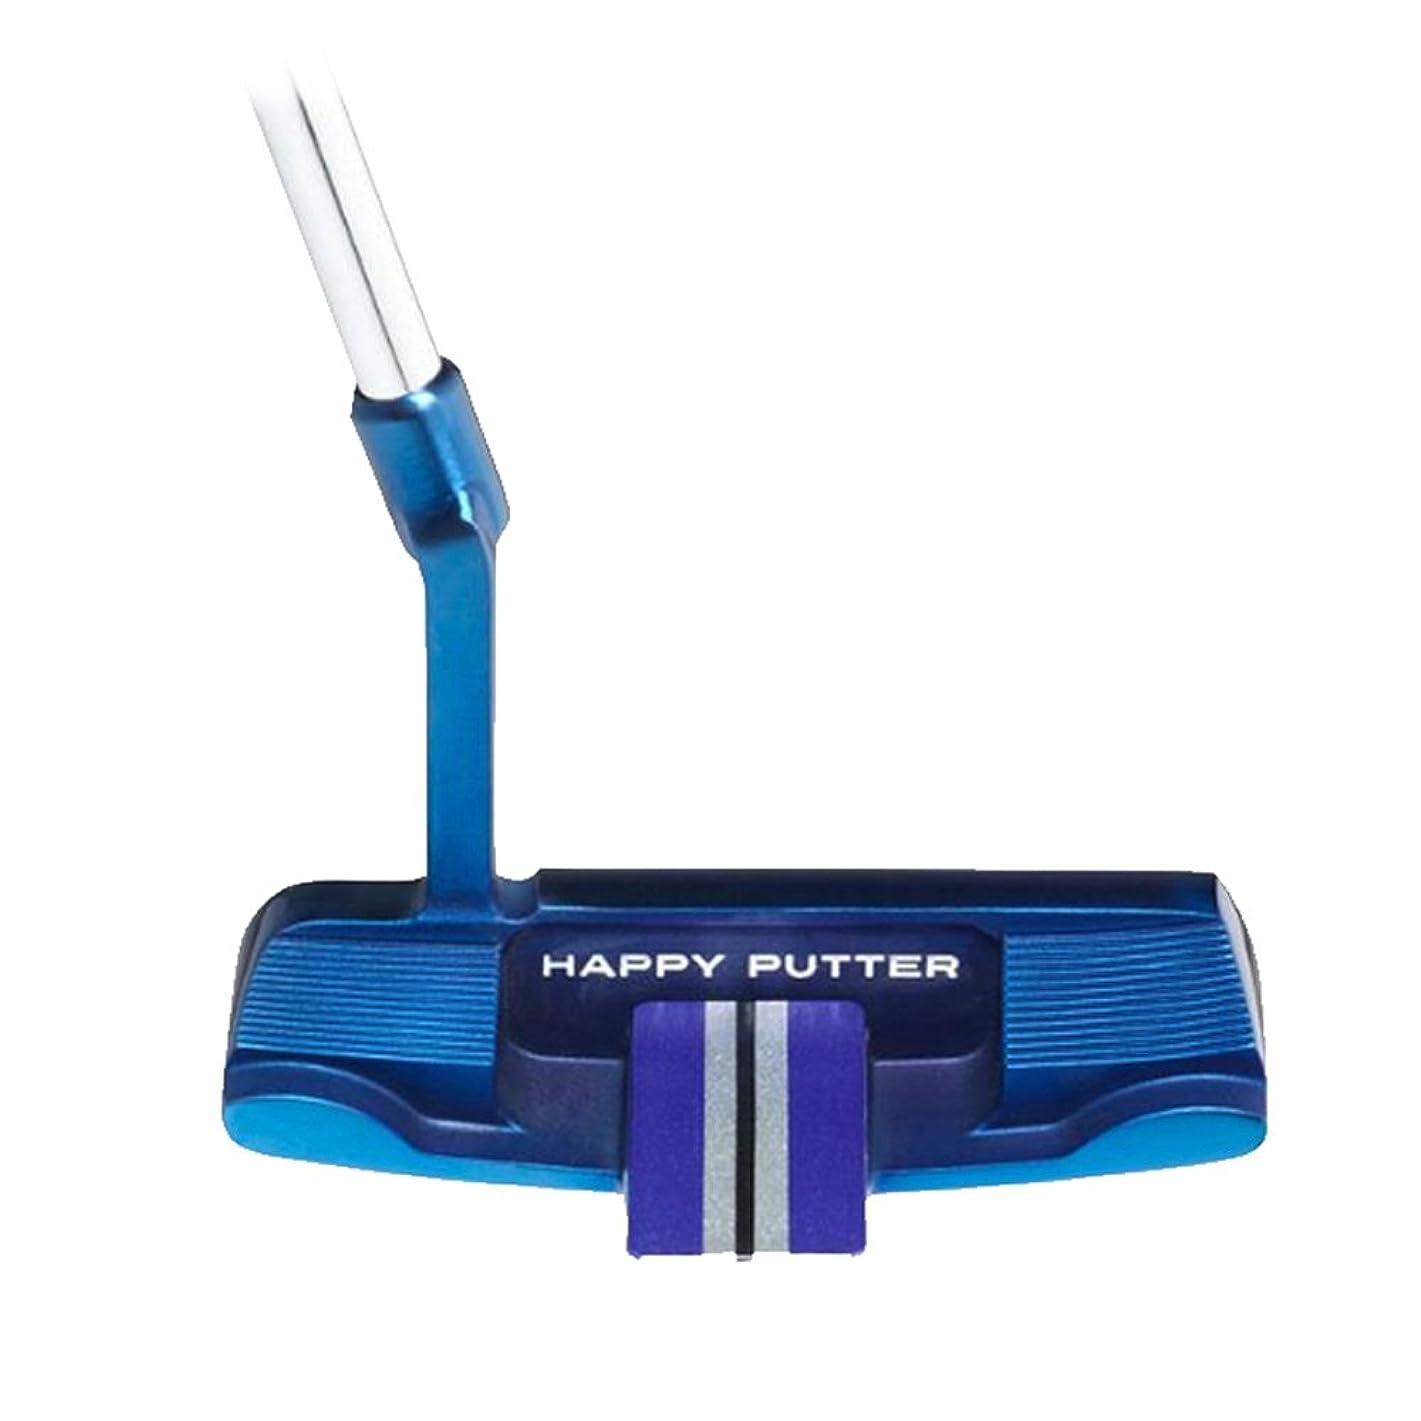 Happy Putter 2019 Eye Align Blade 34